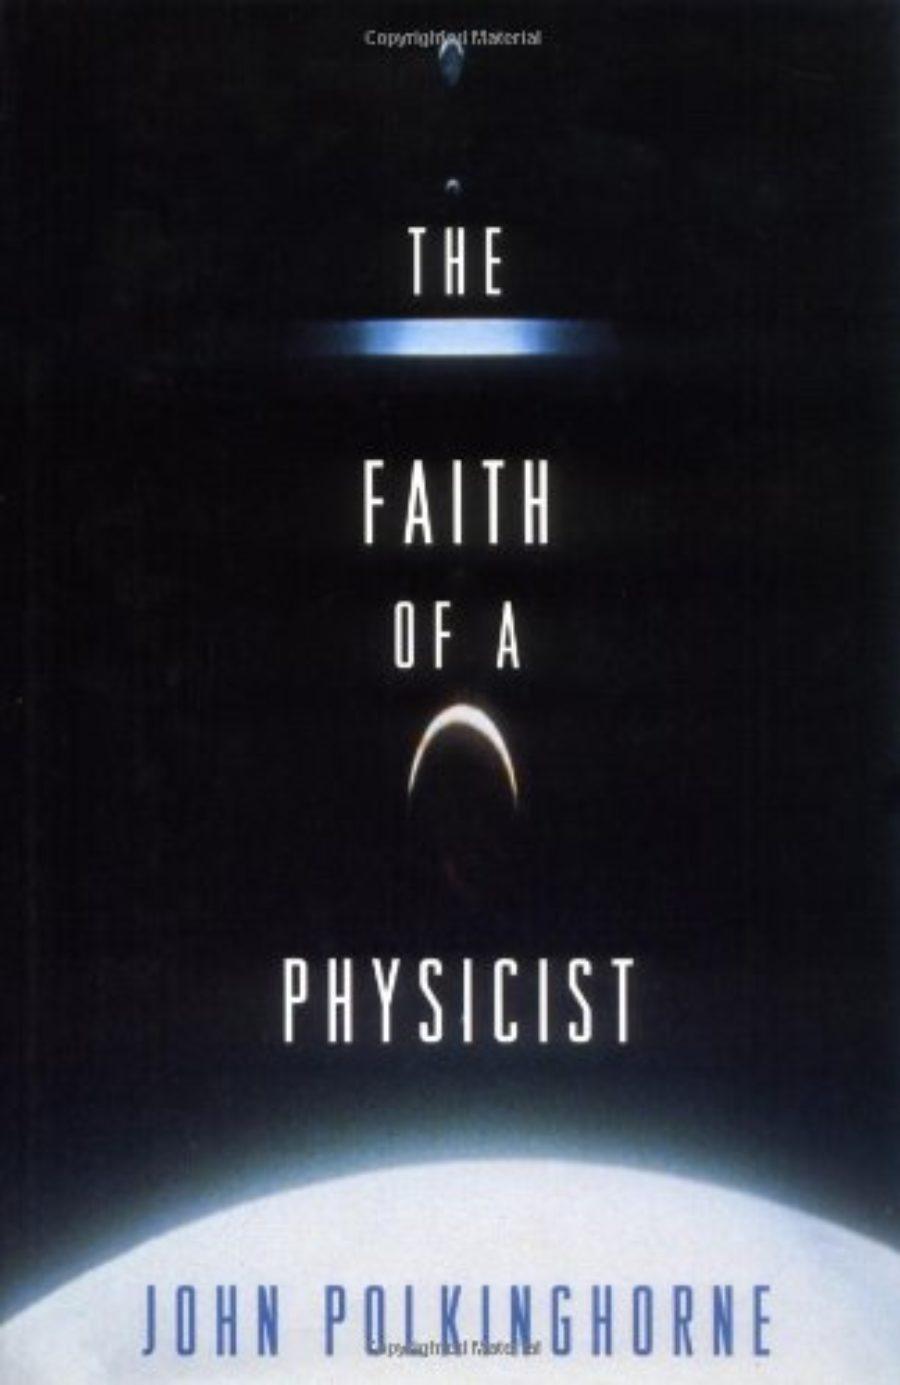 Cover of The Faith of a Physicist